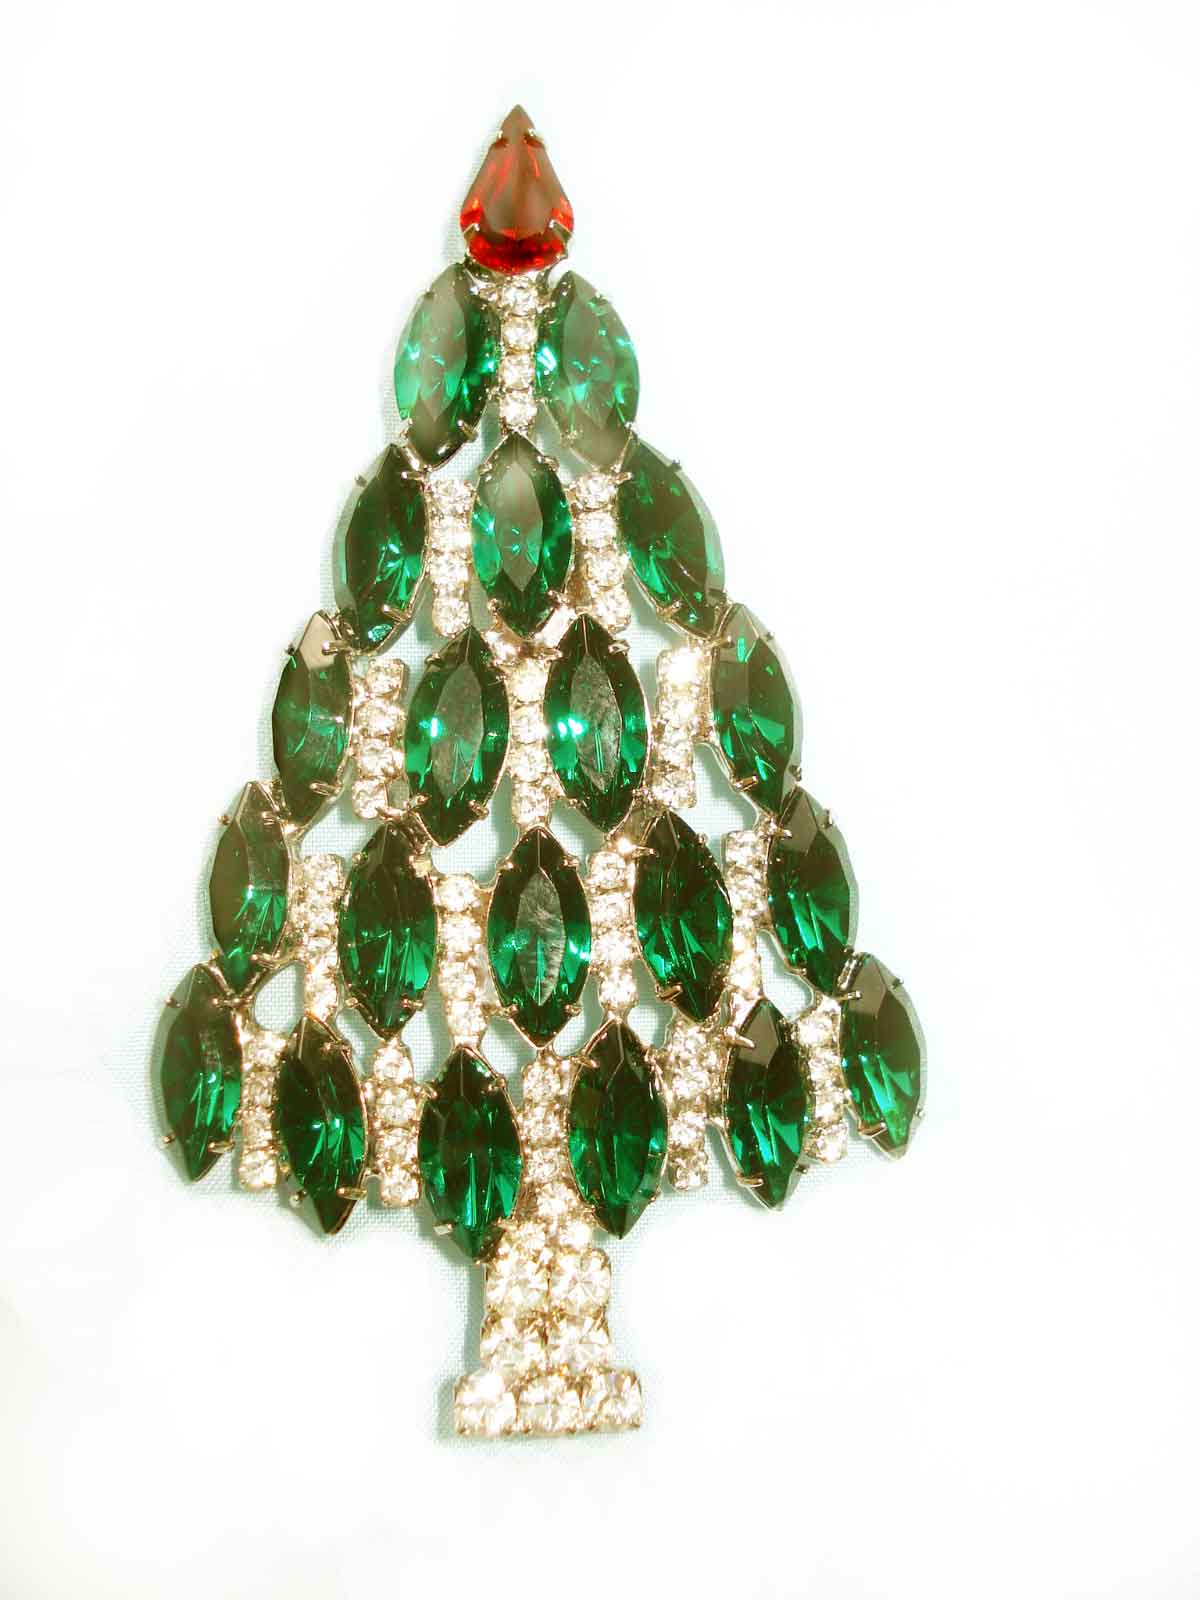 Adorn-Jewels-Adelaide-Jeweller-Custom-Manufacture-Enagagement-Rings-Wedding-Rings